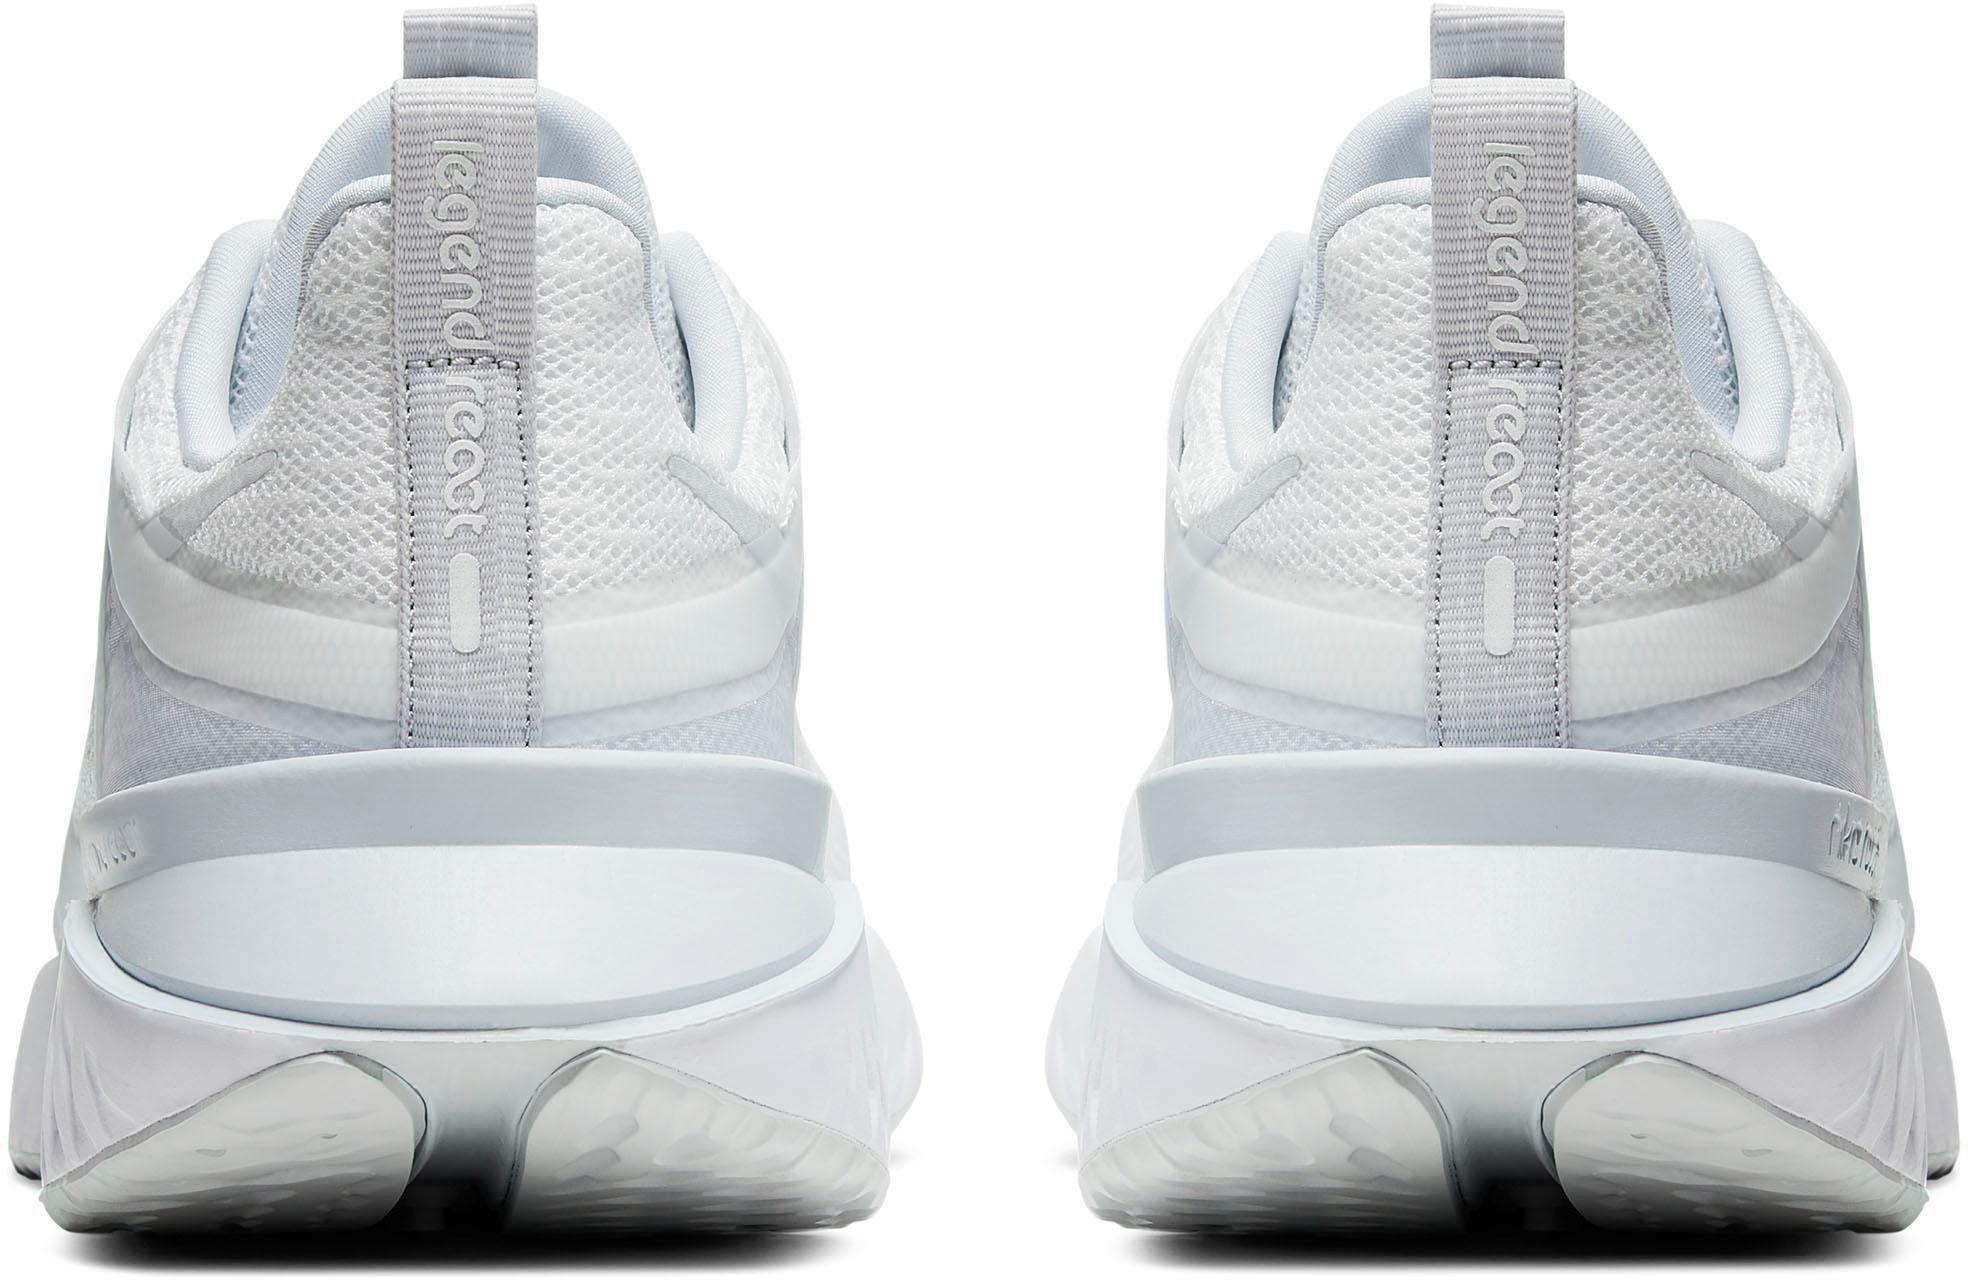 React Nike »wmns 2« Legend Kaufen Online Laufschuh sQrxtChd